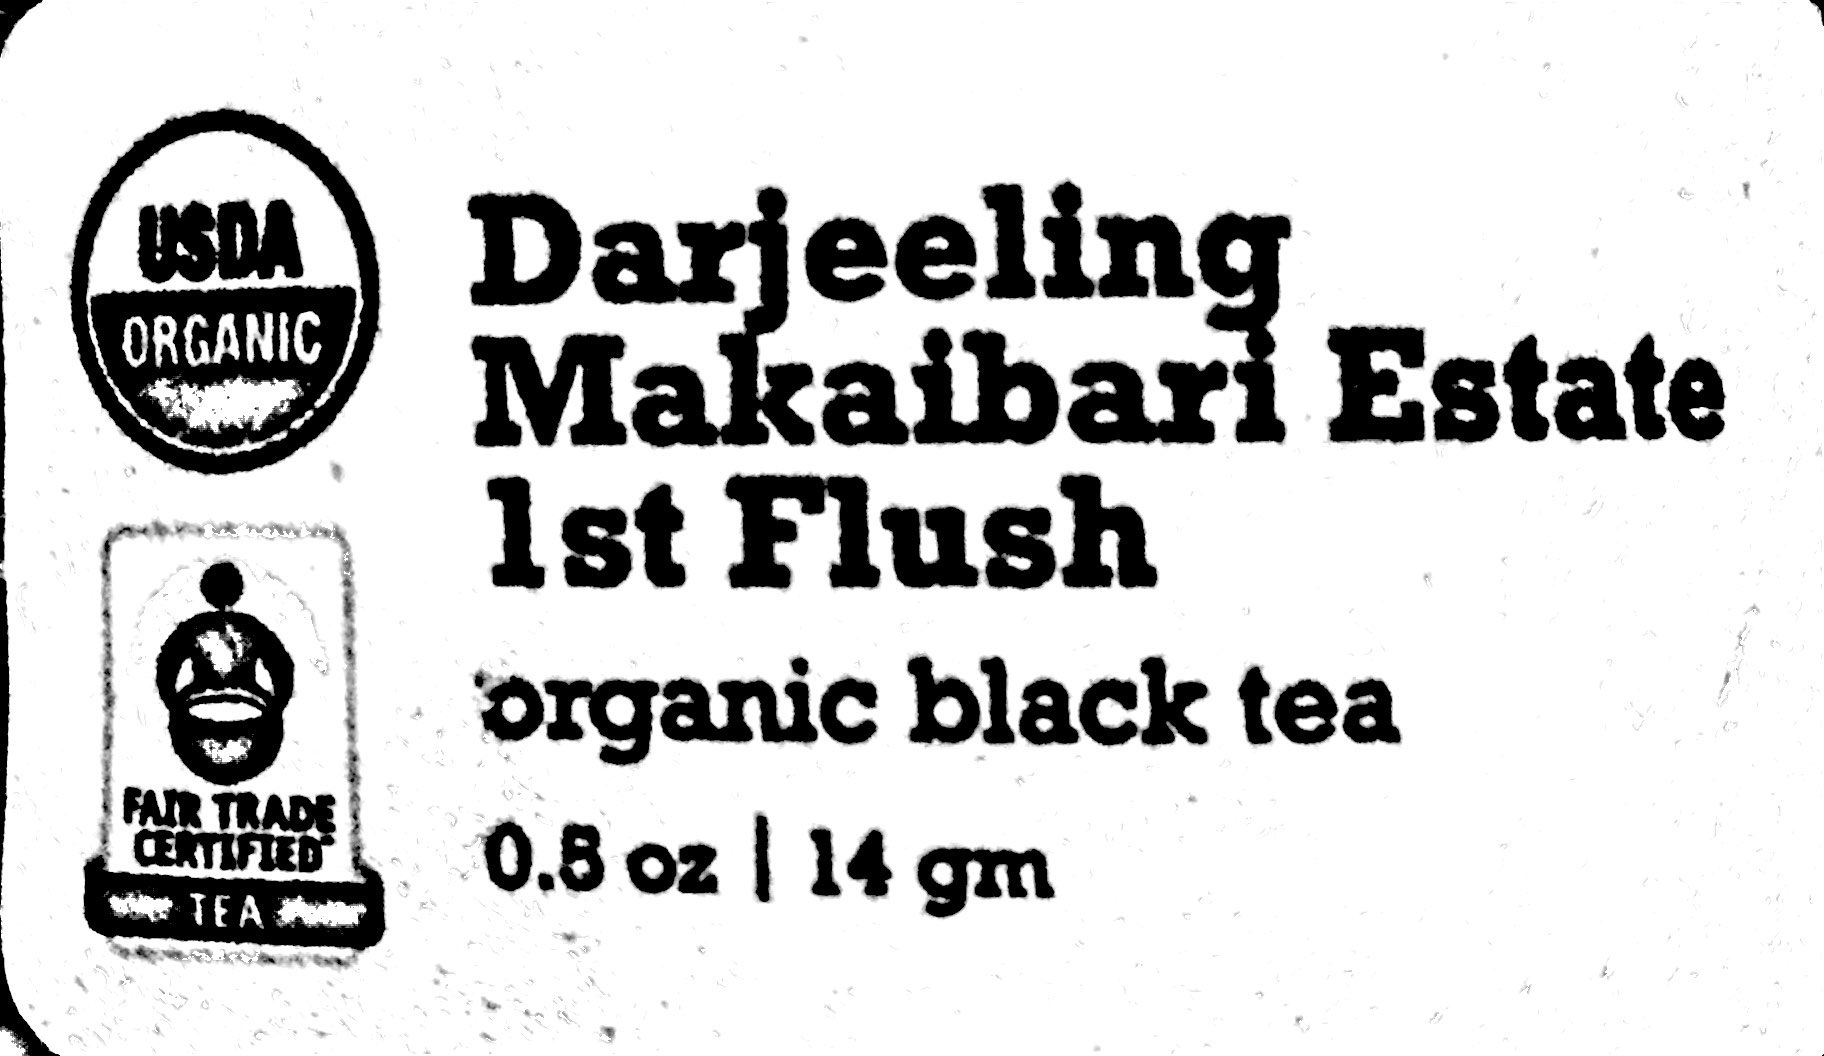 Arbor Teas Incursion January 2016: Darjeeling Makaibari Estate 1st Flush by Jocilyn Mors is licensed under a Creative Commons Attribution-ShareAlike 4.0 International License.